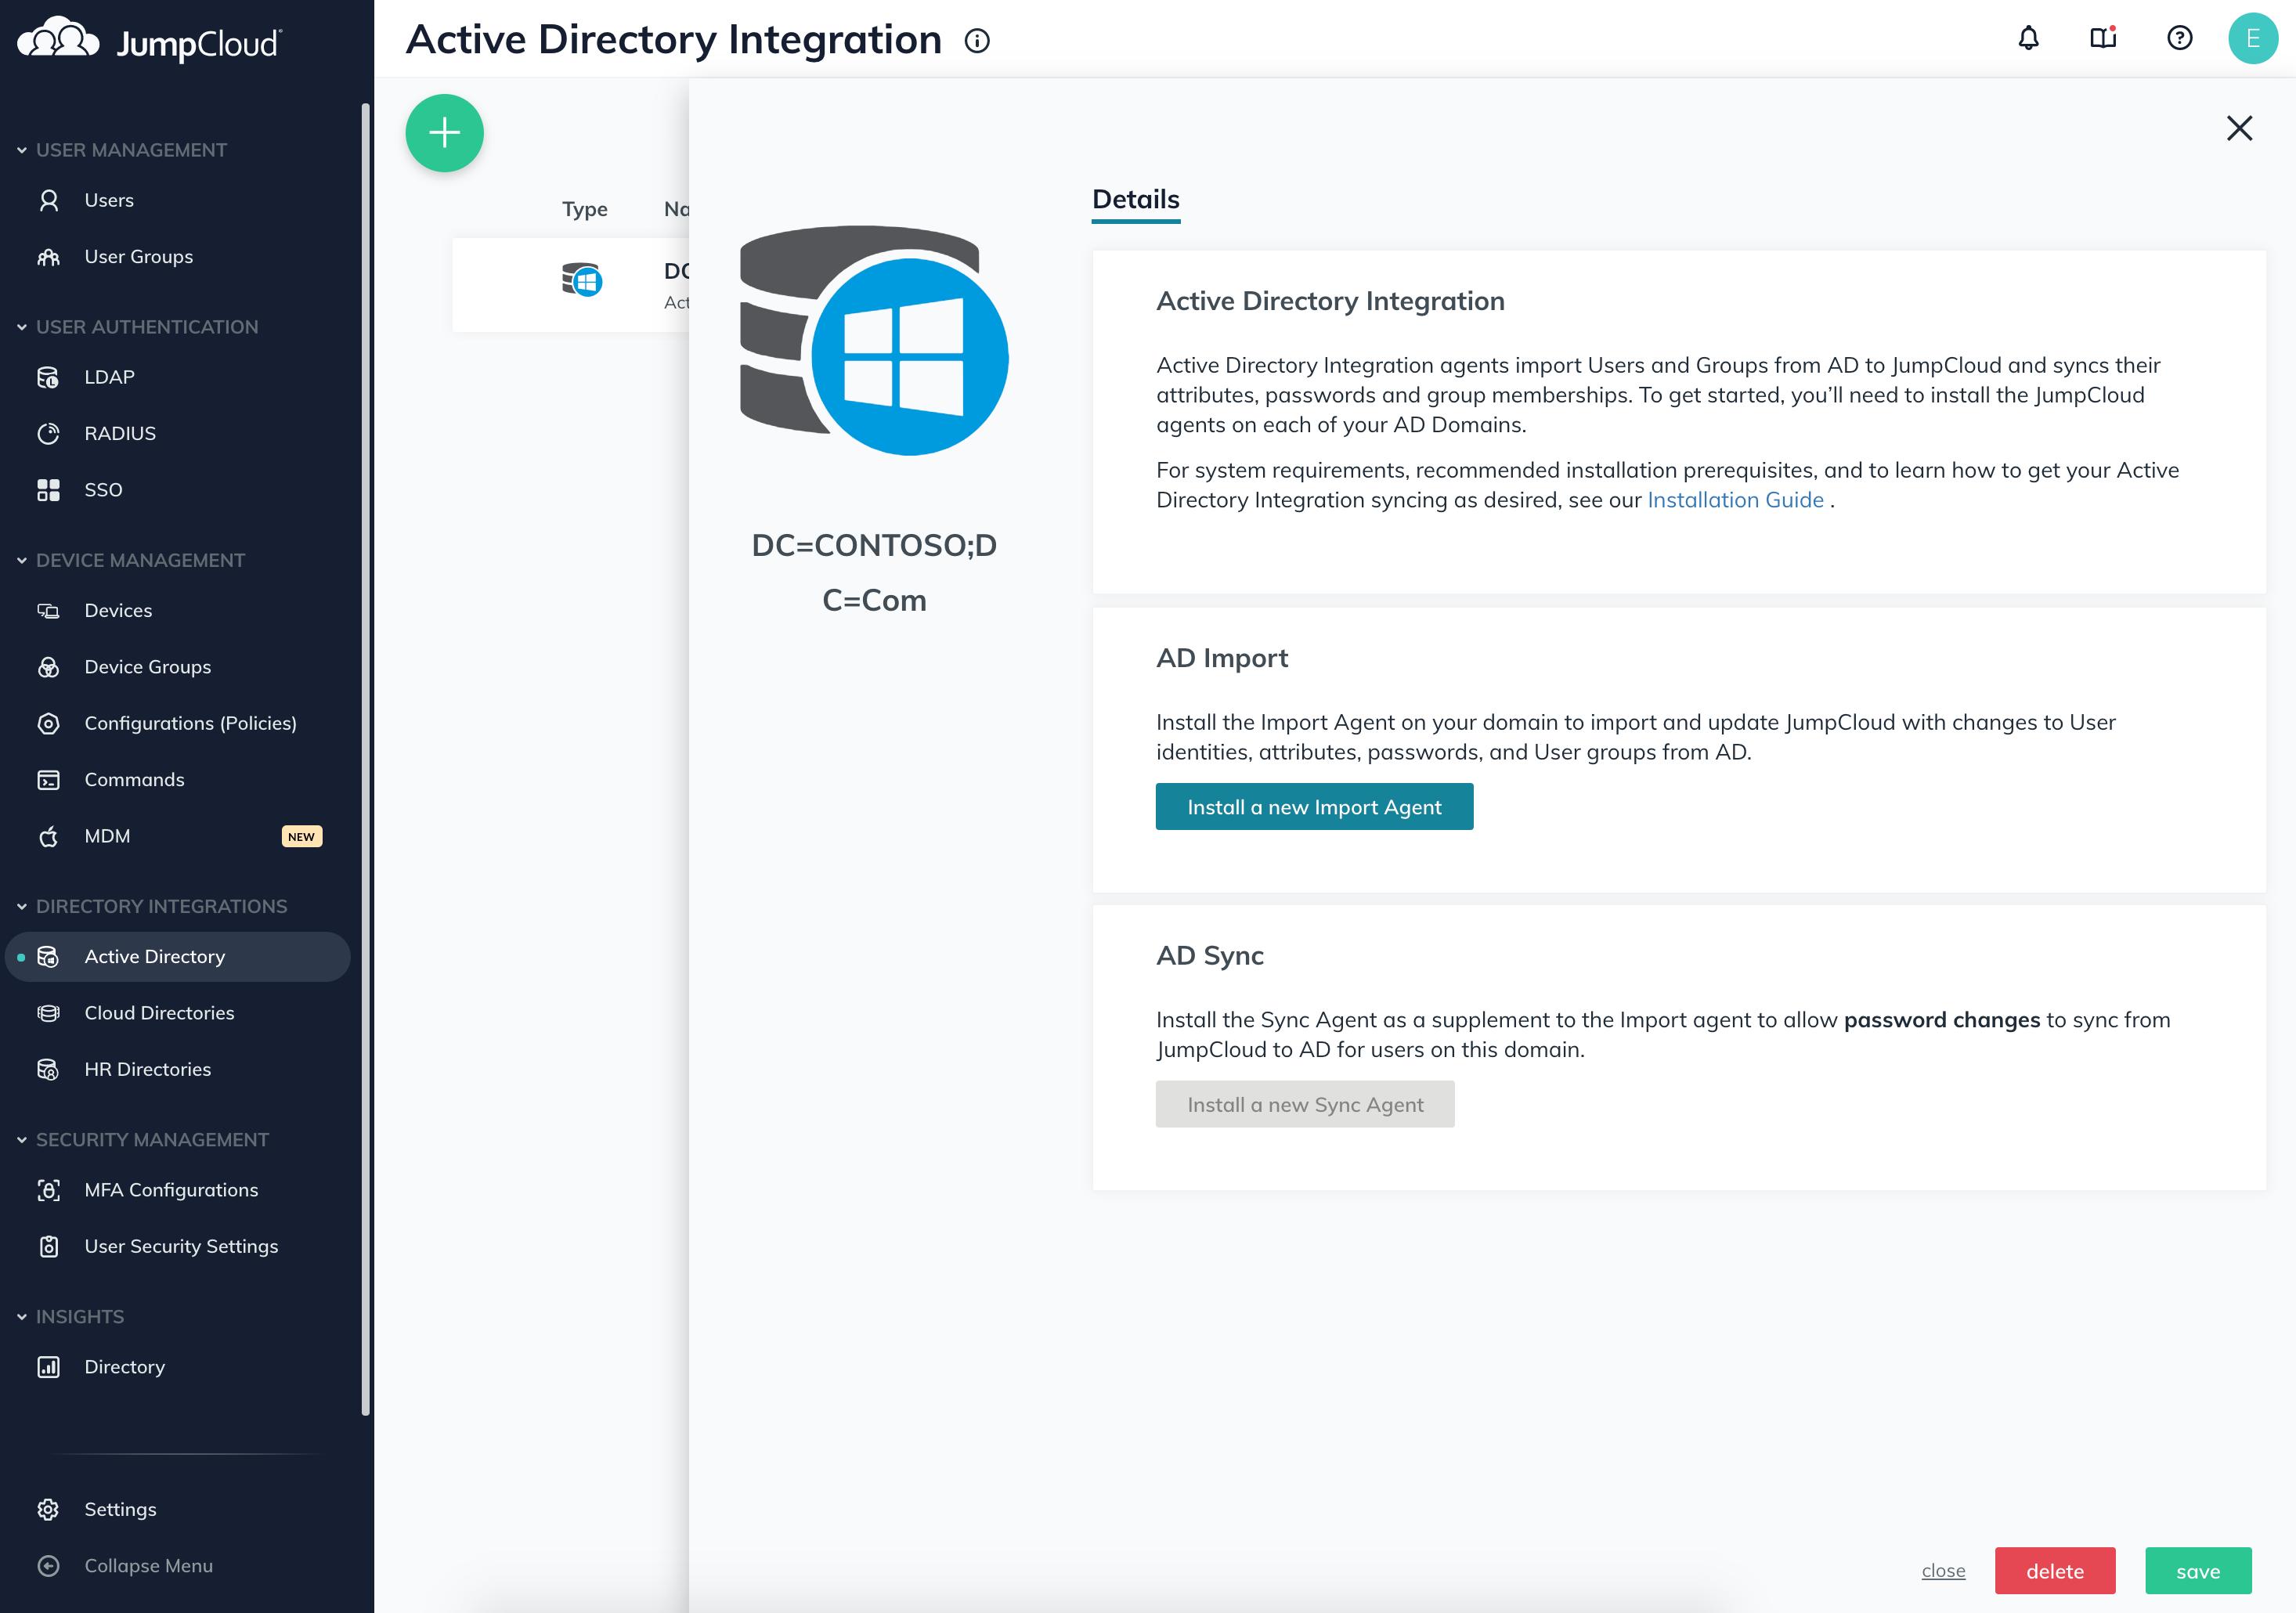 JumpCloud Directory Platform Software - JumpCloud Directory-as-a-Service Azure Active Directory integration